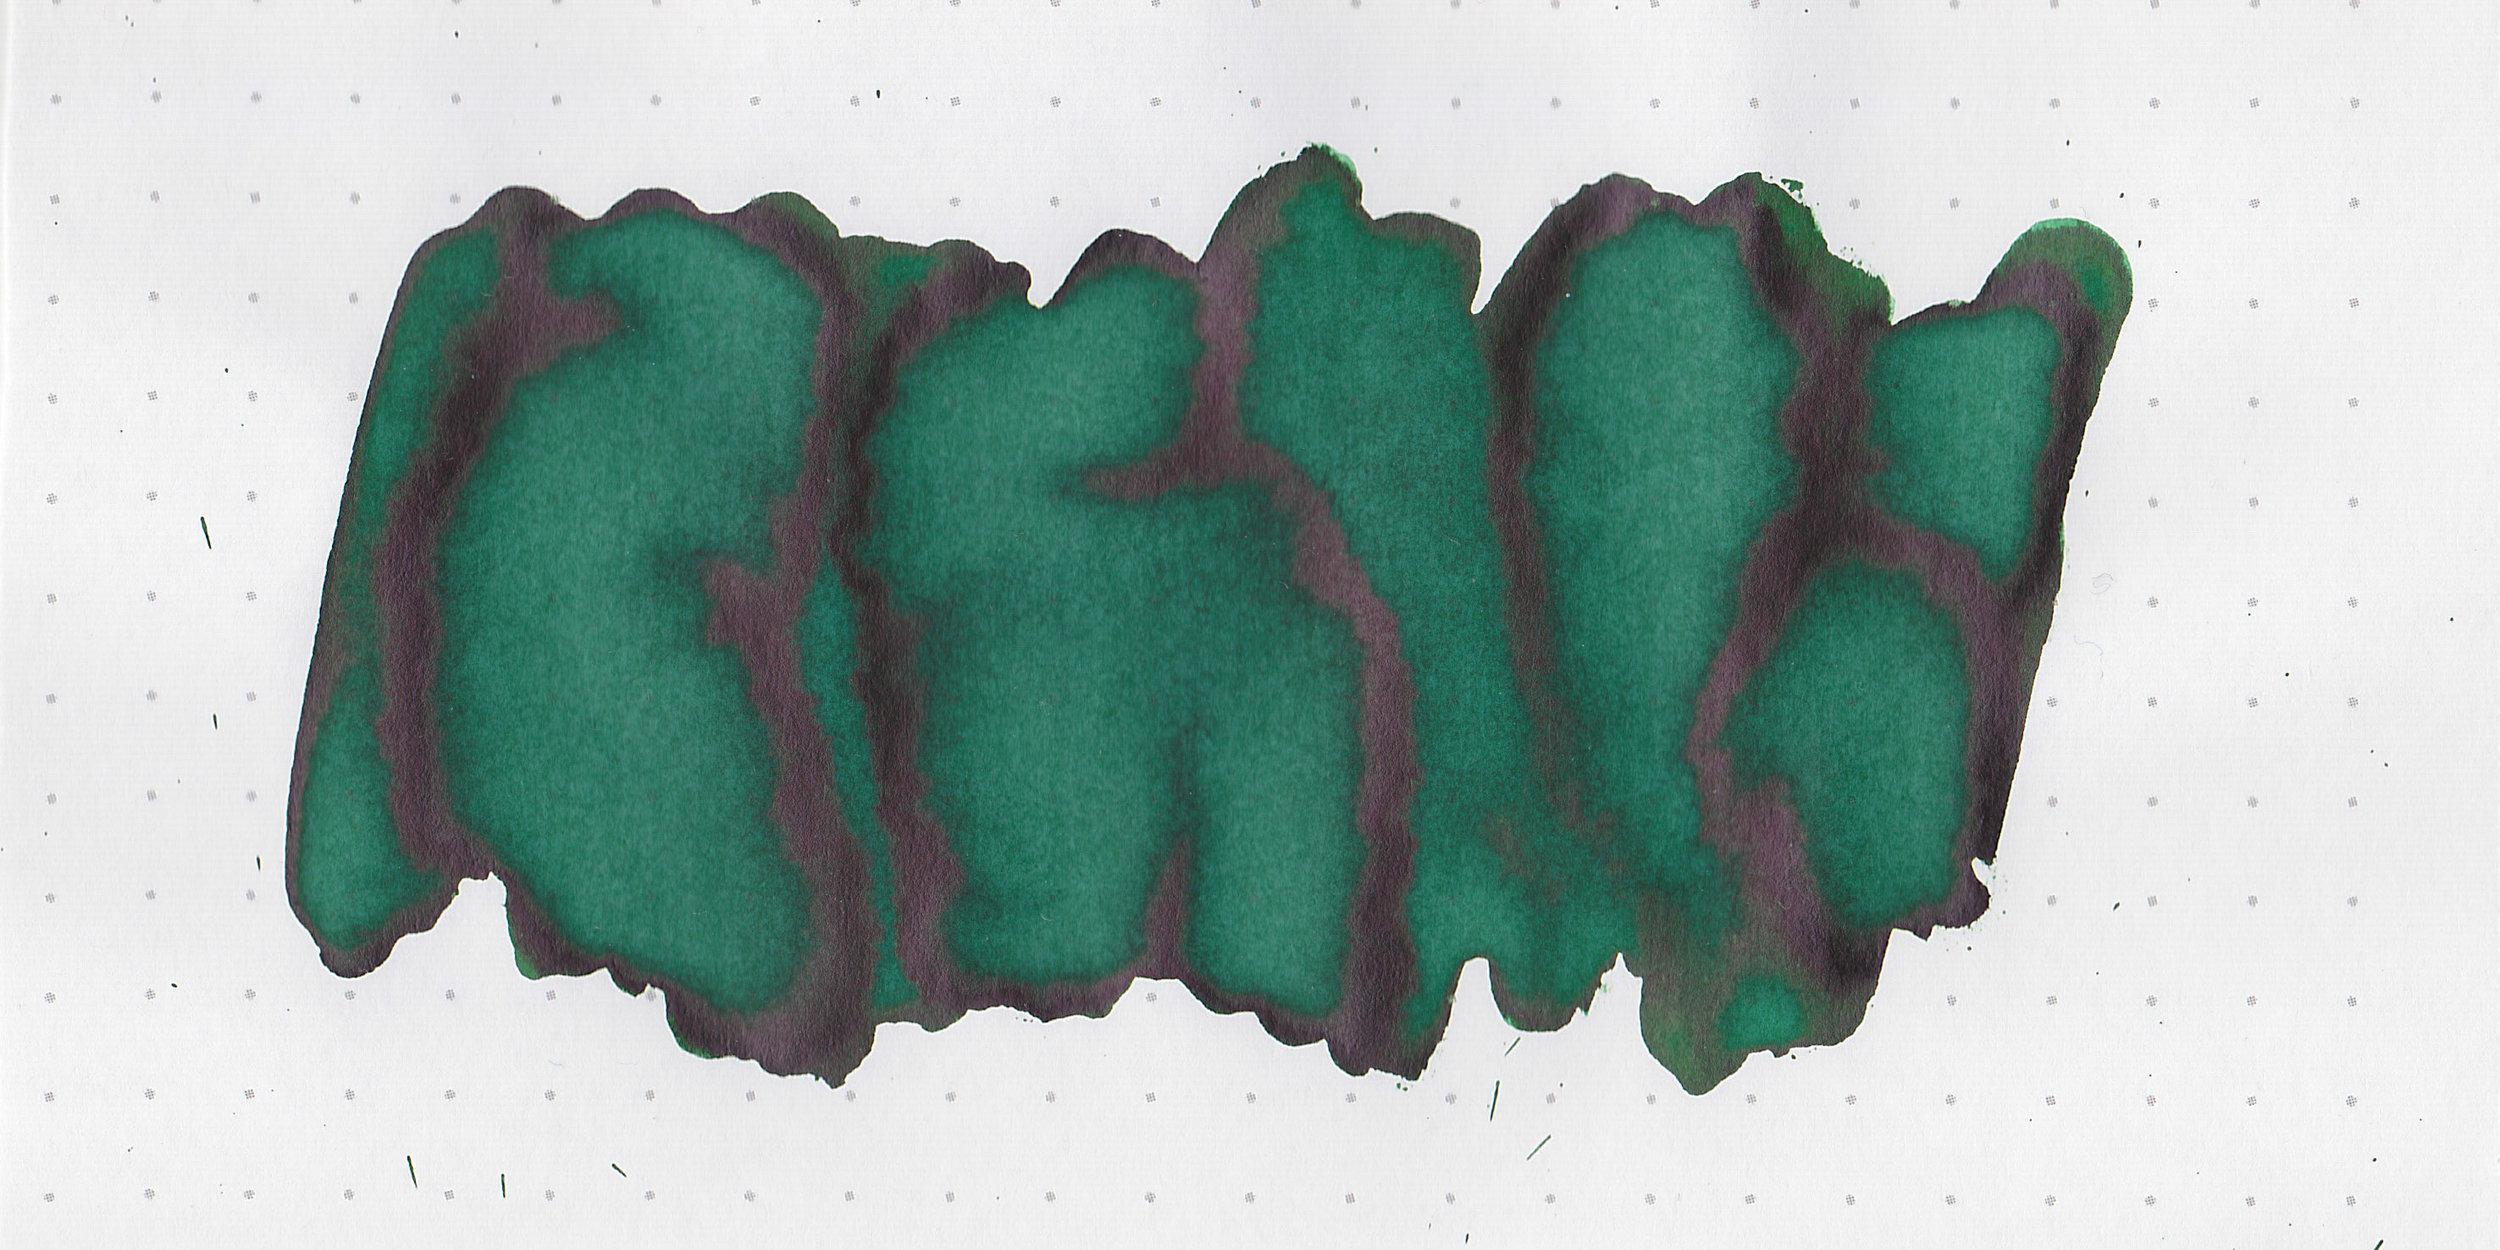 tac-midori-green-3.jpg